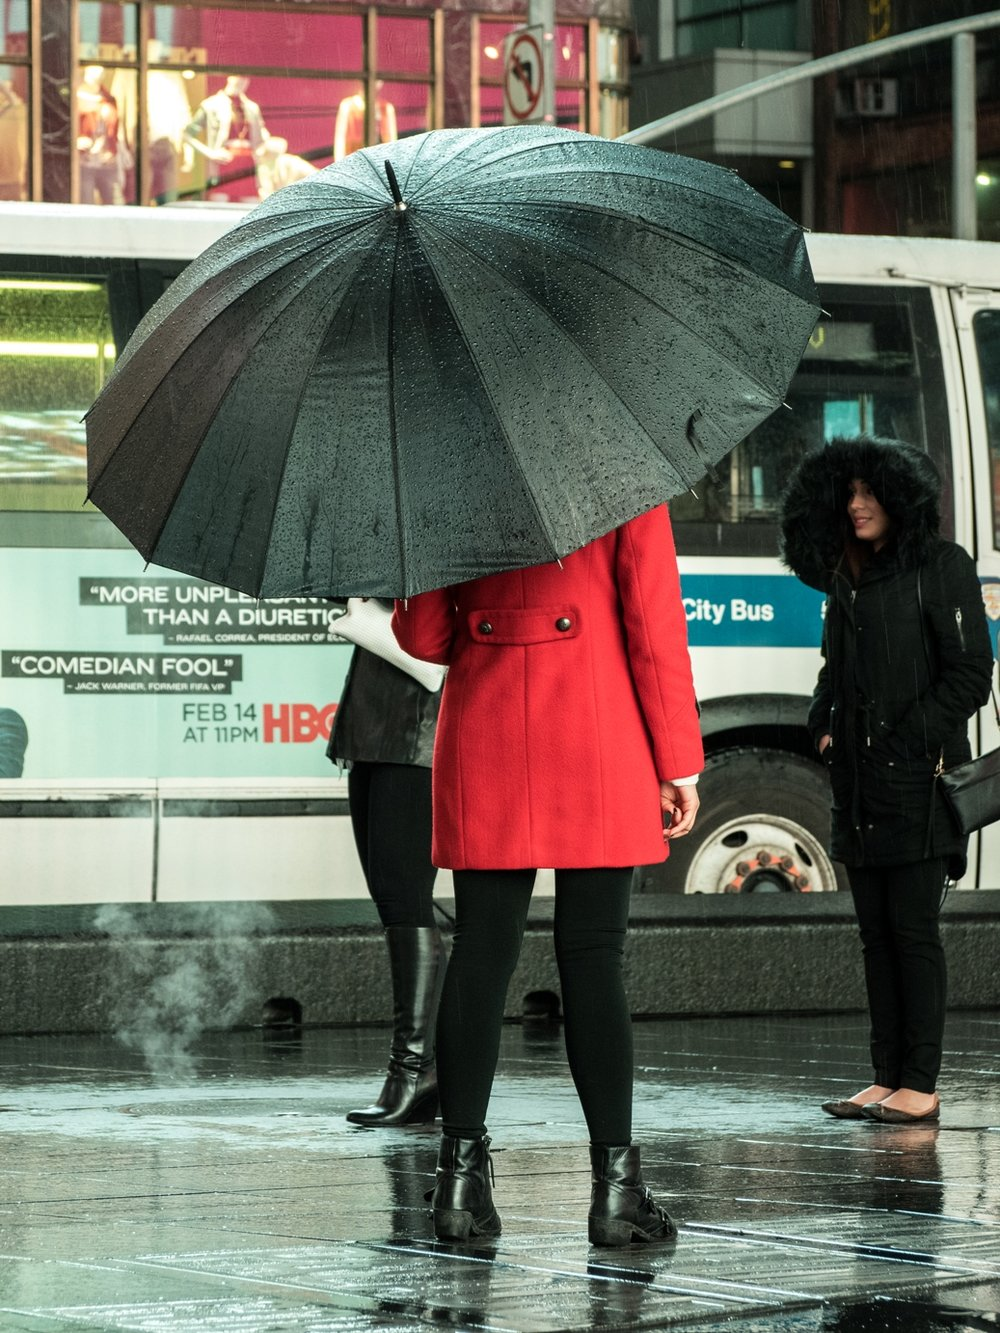 umbrella print.jpg